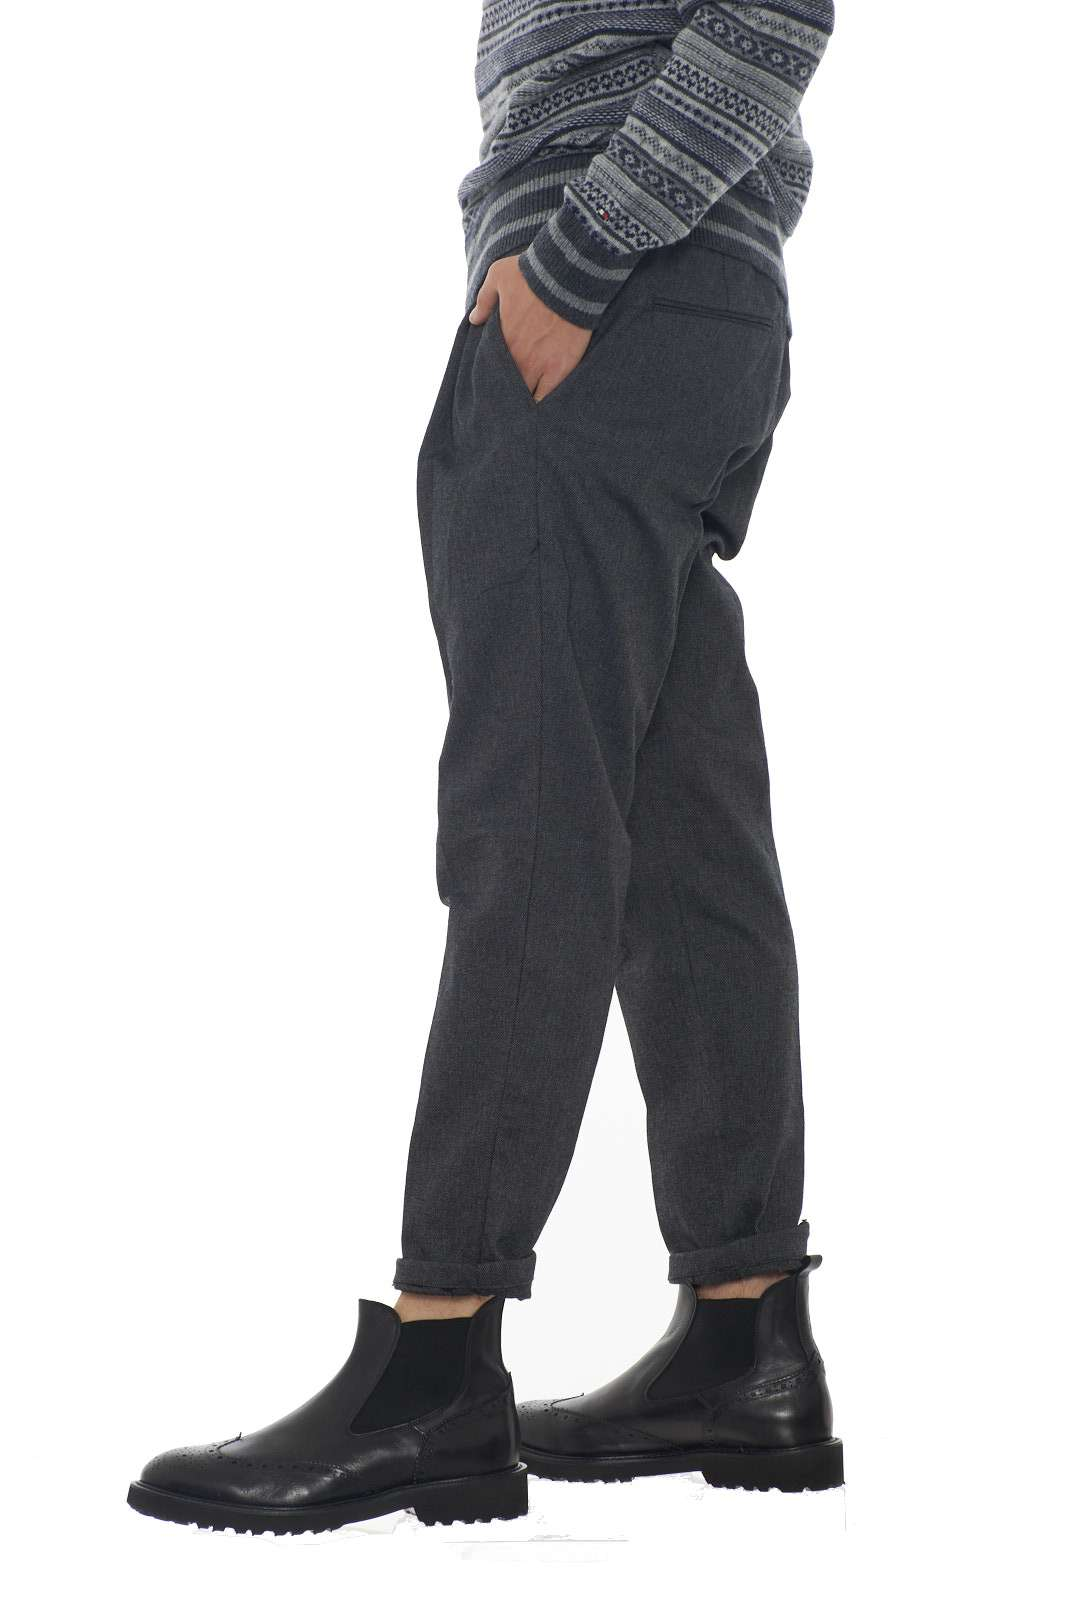 https://www.parmax.com/media/catalog/product/a/i/AI-outlet_parmax-pantaloni-uomo-Micheal%20Coal-johnny3298-C.jpg